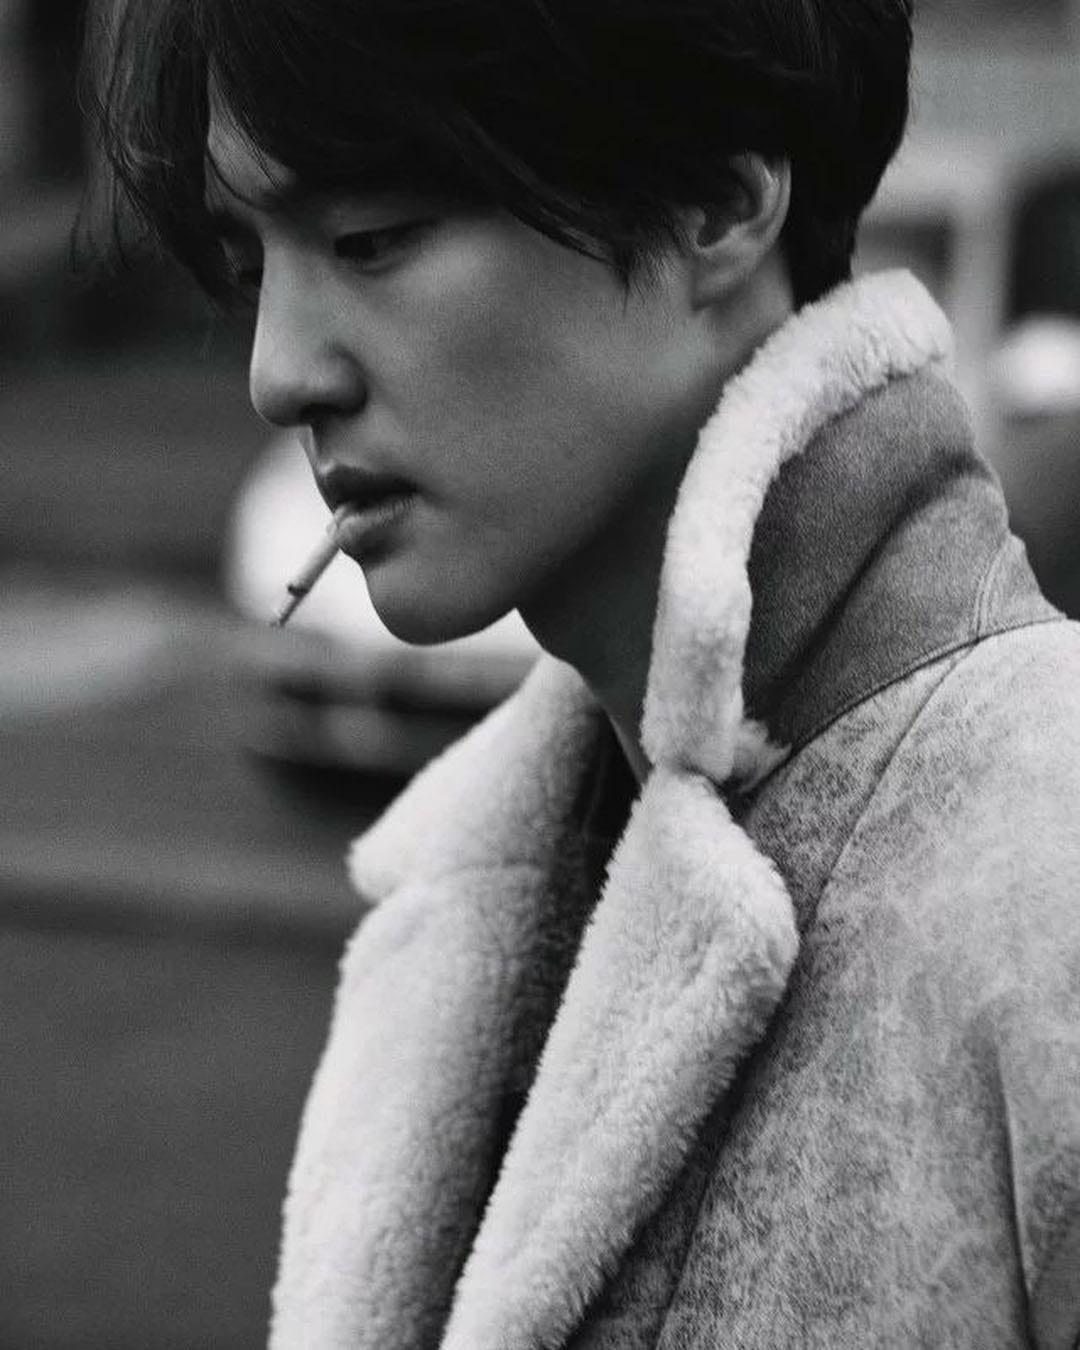 Photoshoot de Yang Se-jong pose pour Harper's Bazaar 2017